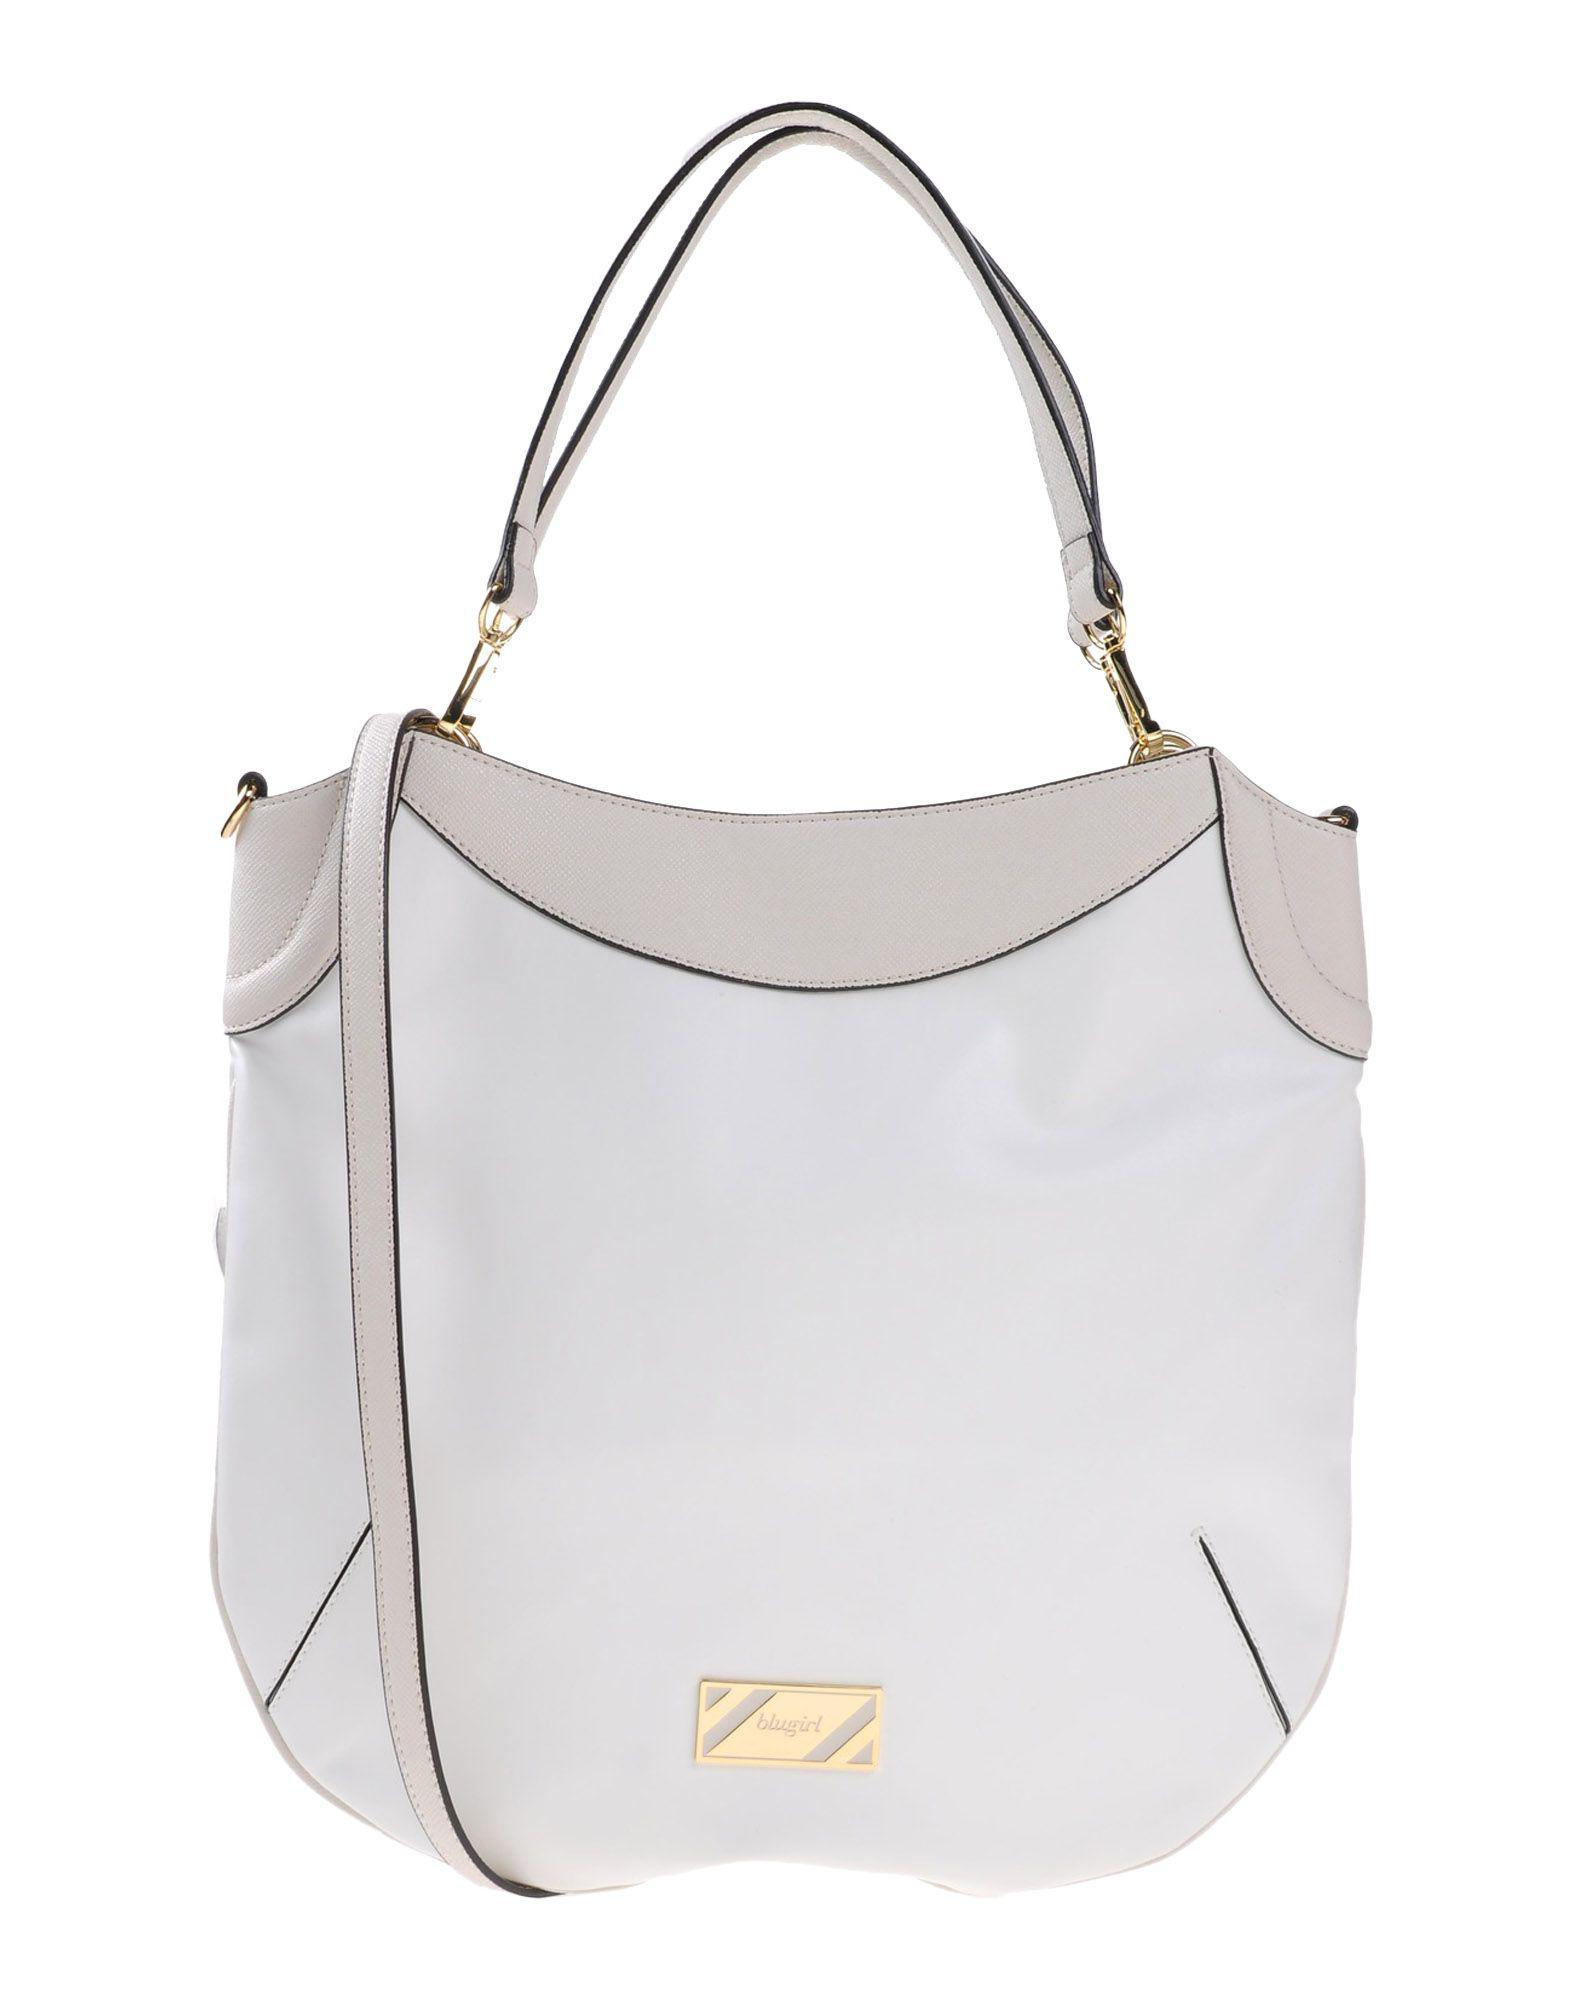 38ca2d3e4eb1 Lyst - Blugirl Blumarine Handbag in White